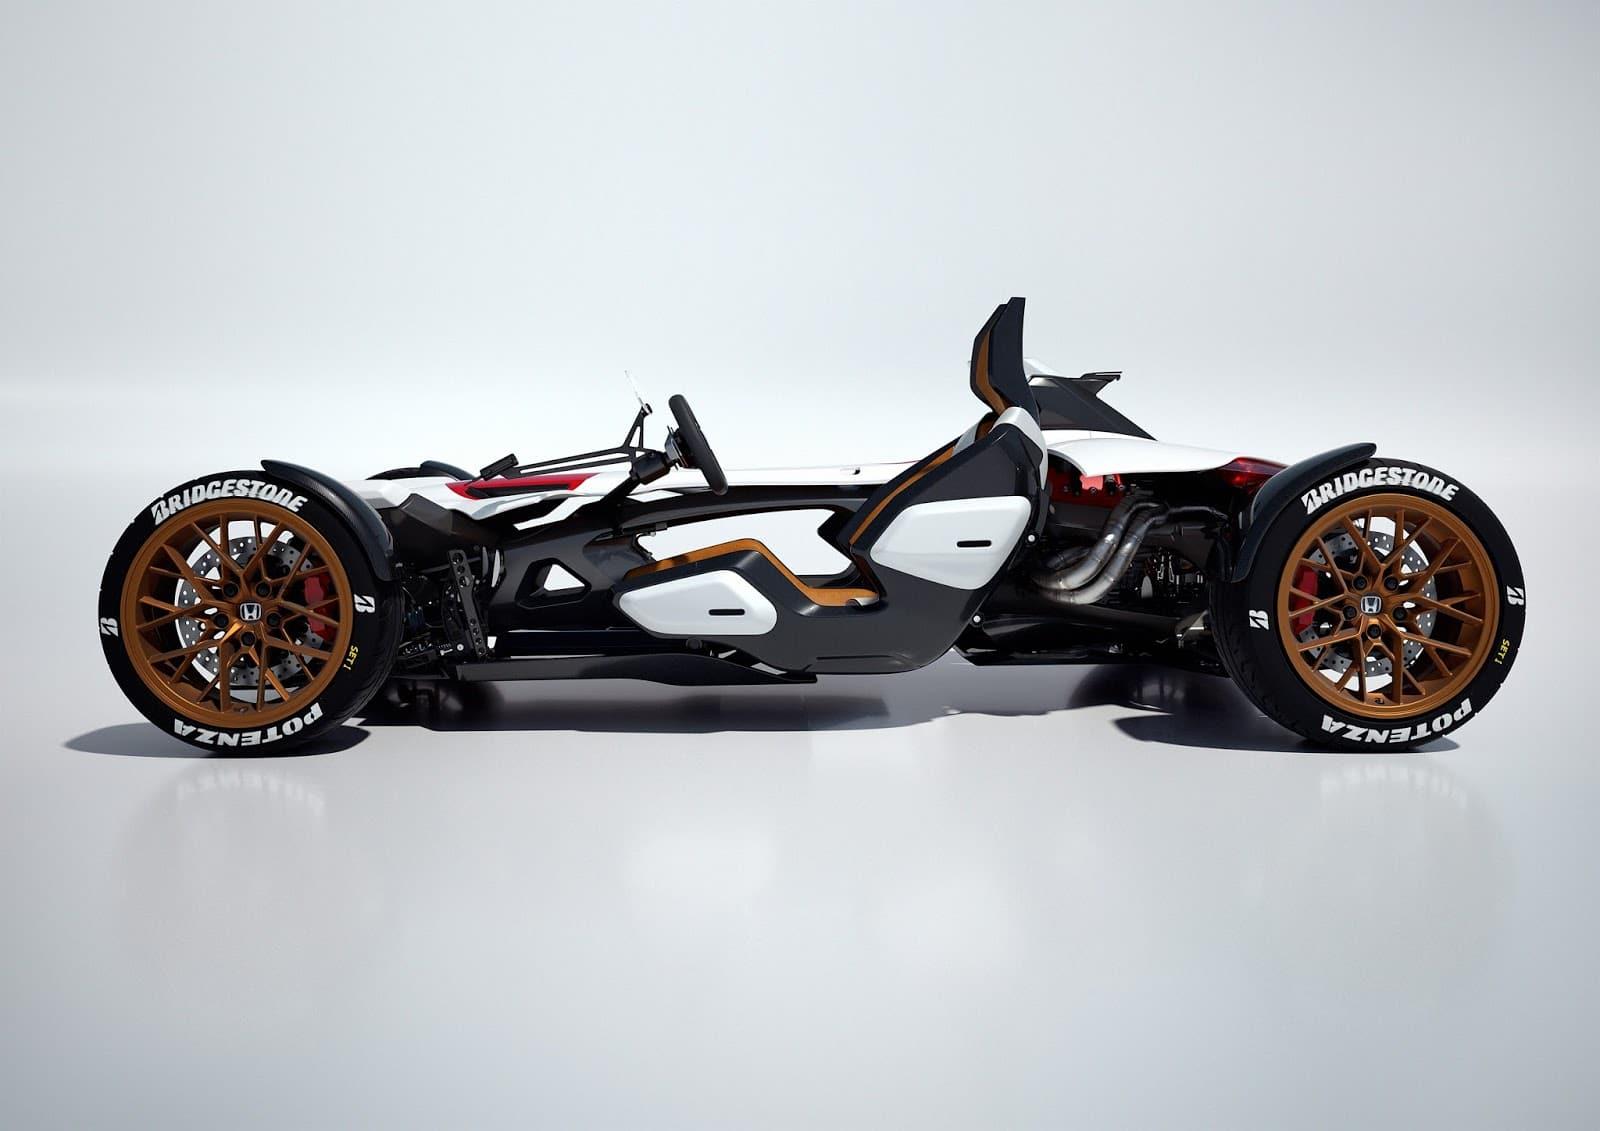 60620 HONDA PROJECT 2 4 POWERED BY RC213V Αυτοκίνητο ή μοτοσικλέτα; Και τα δυο σε ένα μας λέει η Honda Frankfurt Motor Show, Global Design Project, Honda, Honda design, Honda Project 2&4